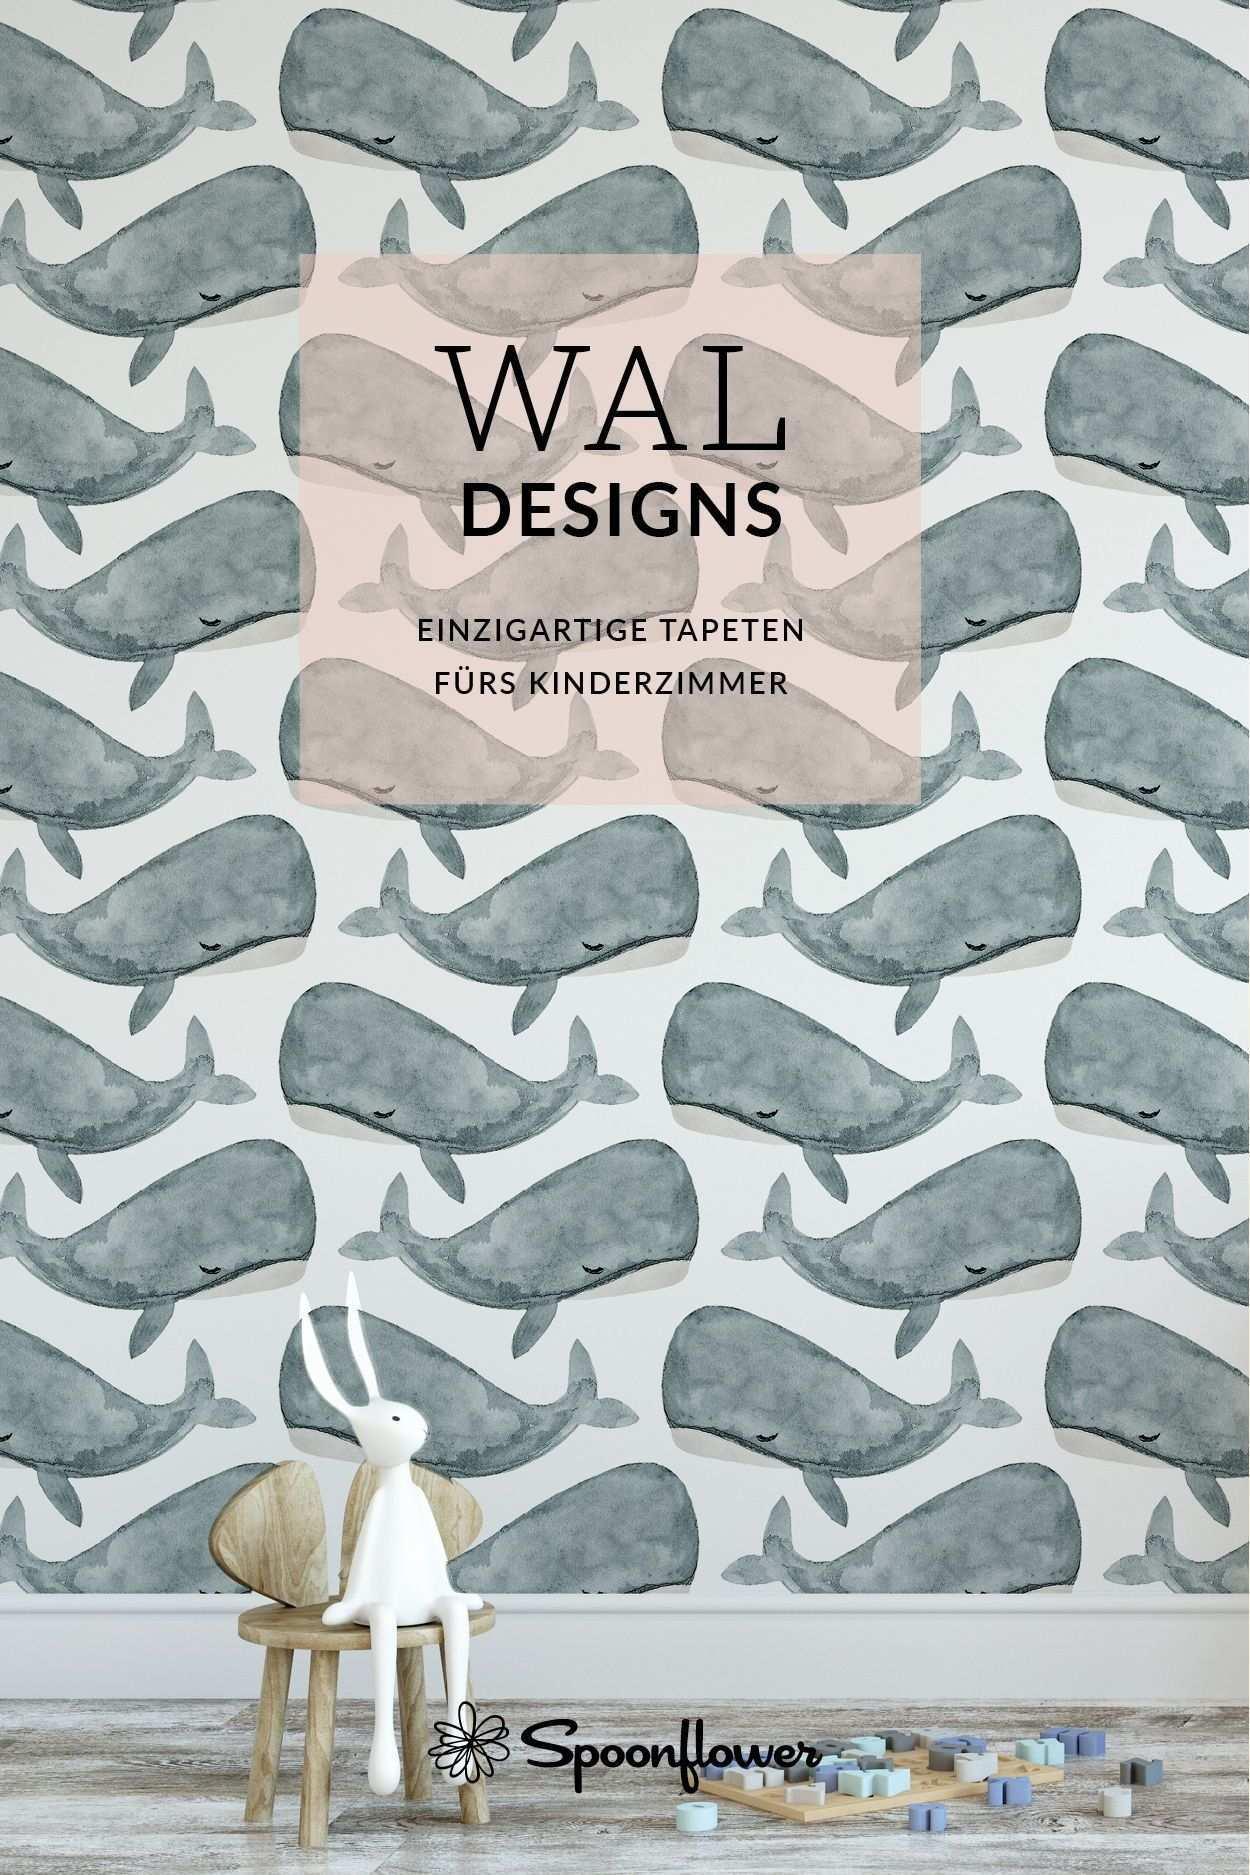 Wandgestaltung Furs Kinderzimmer Spoonflower In 2020 Music Room Decor Wall Design Design